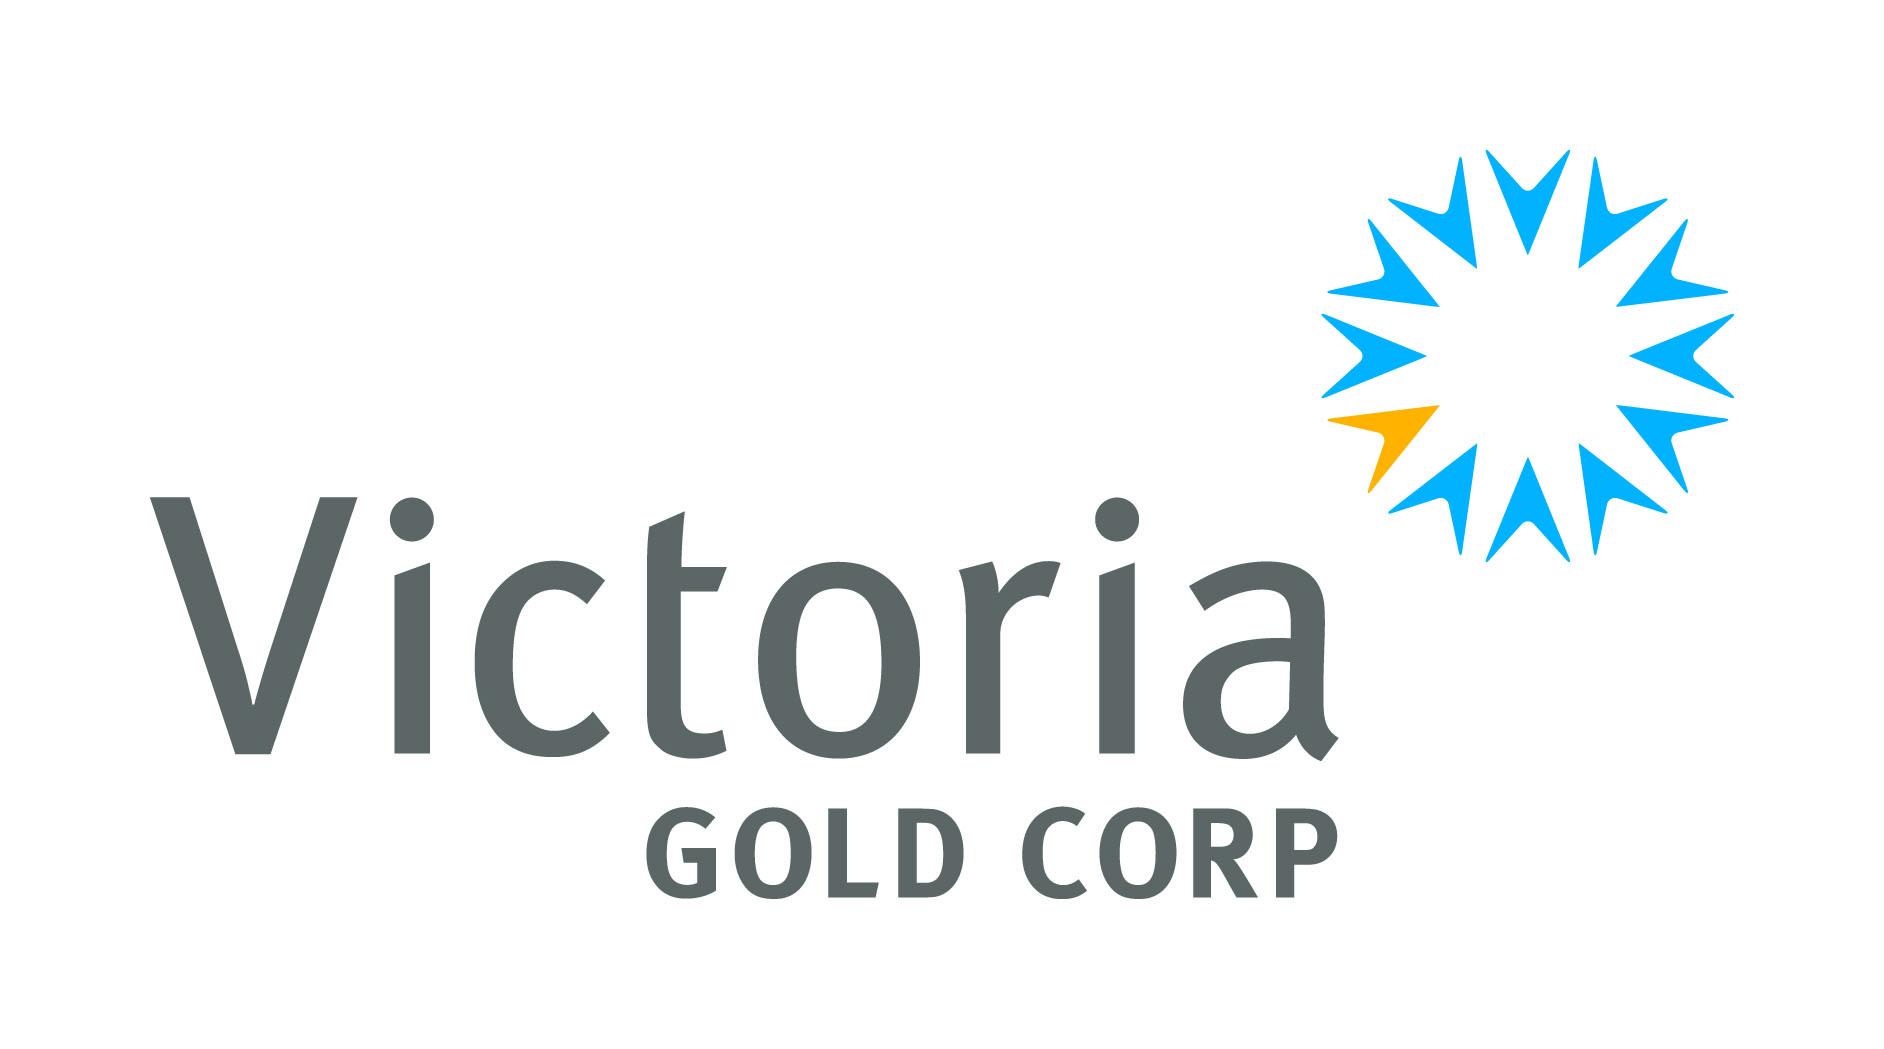 Victoria Gold Corp.